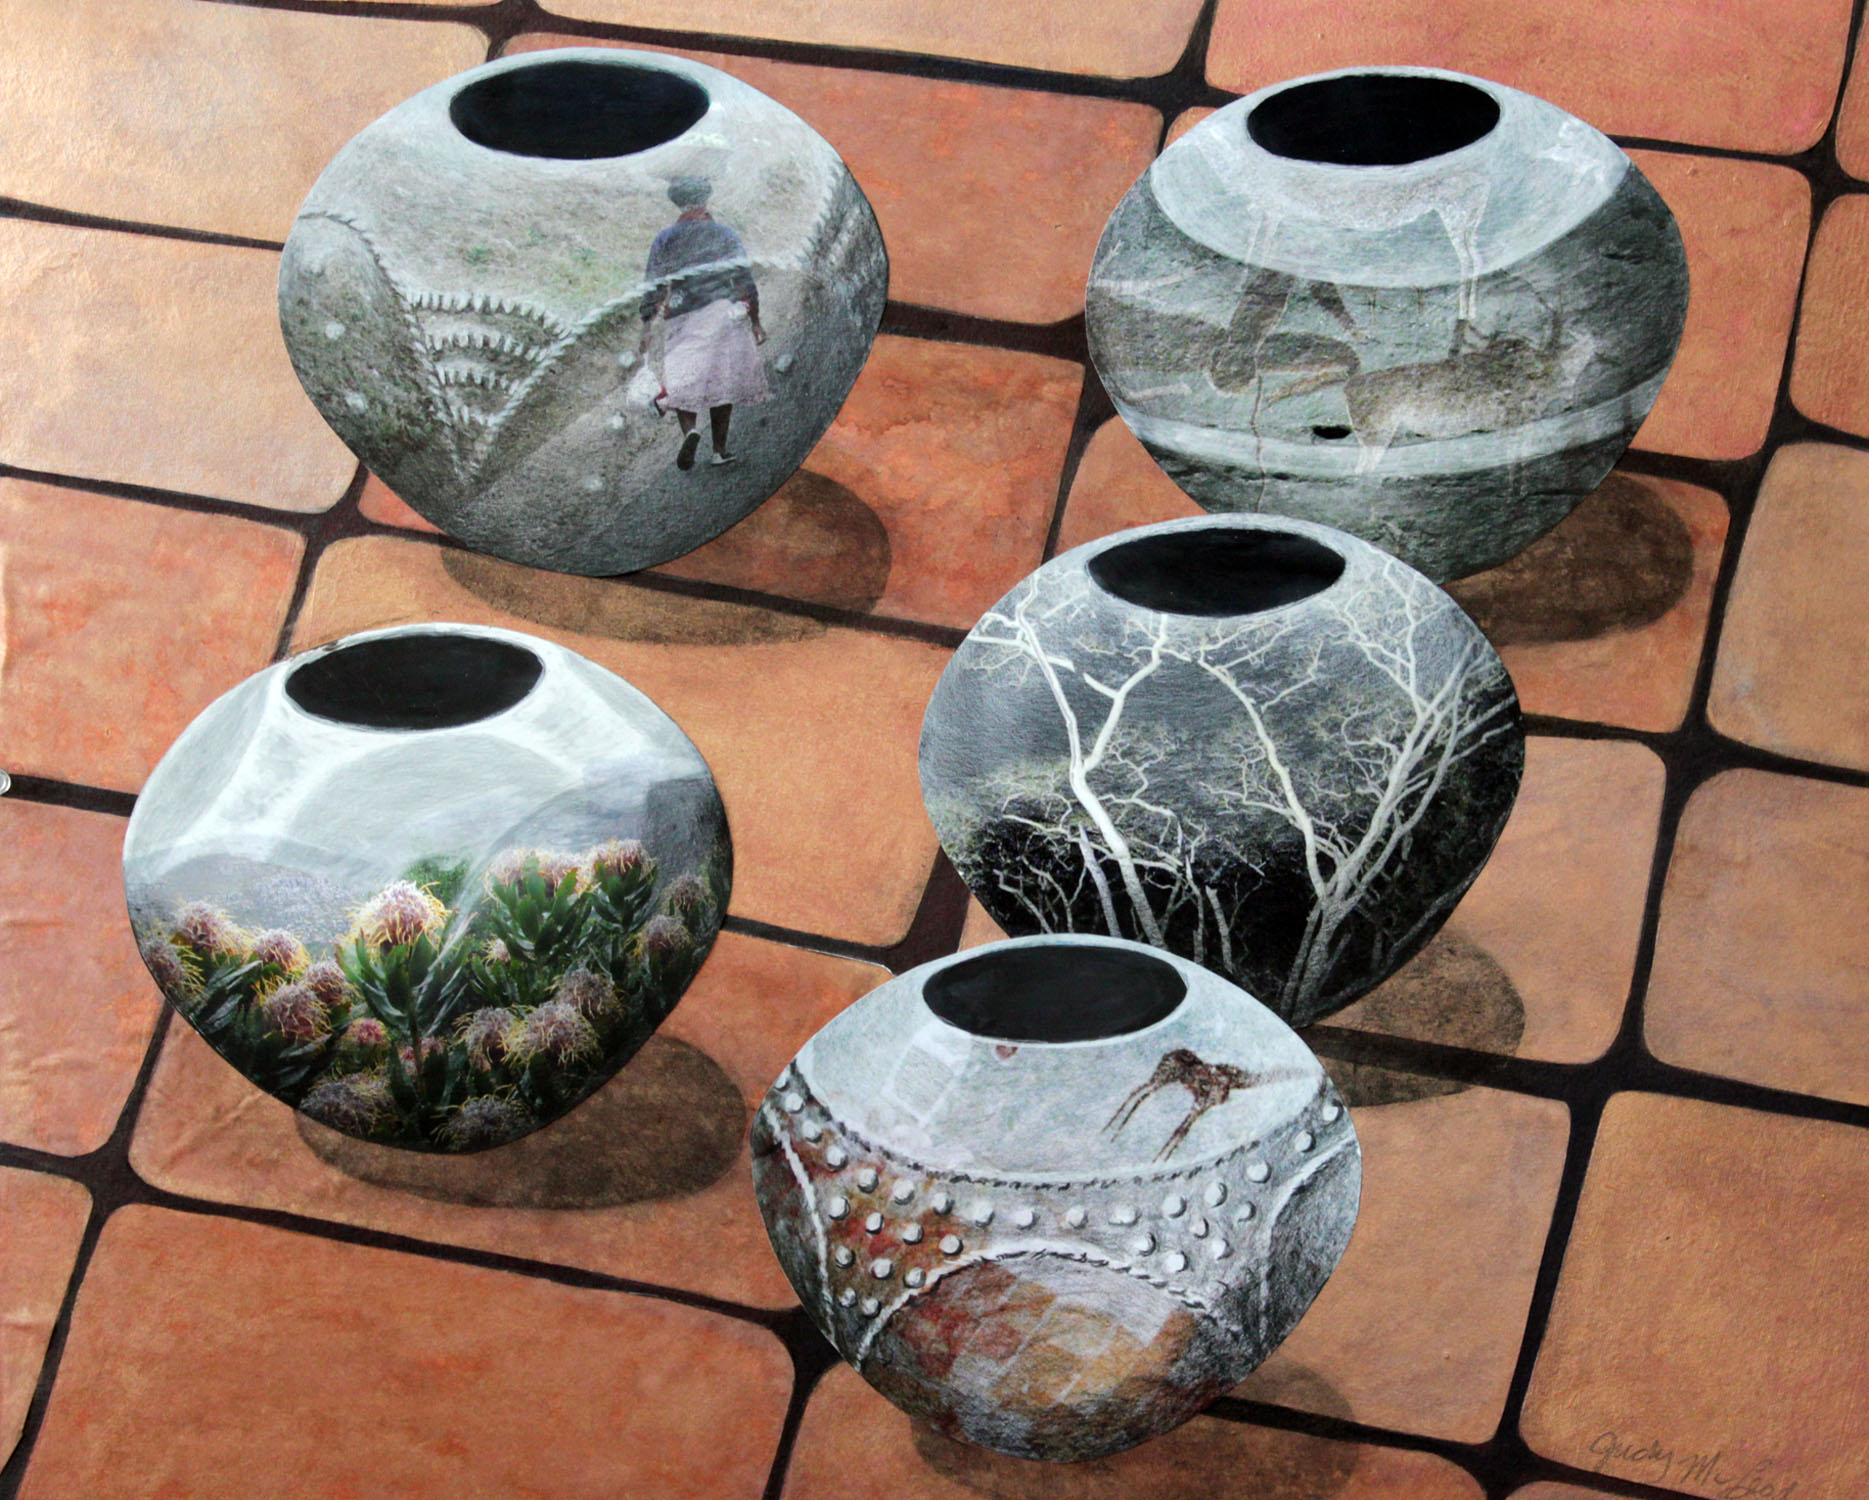 Zulu woman's work